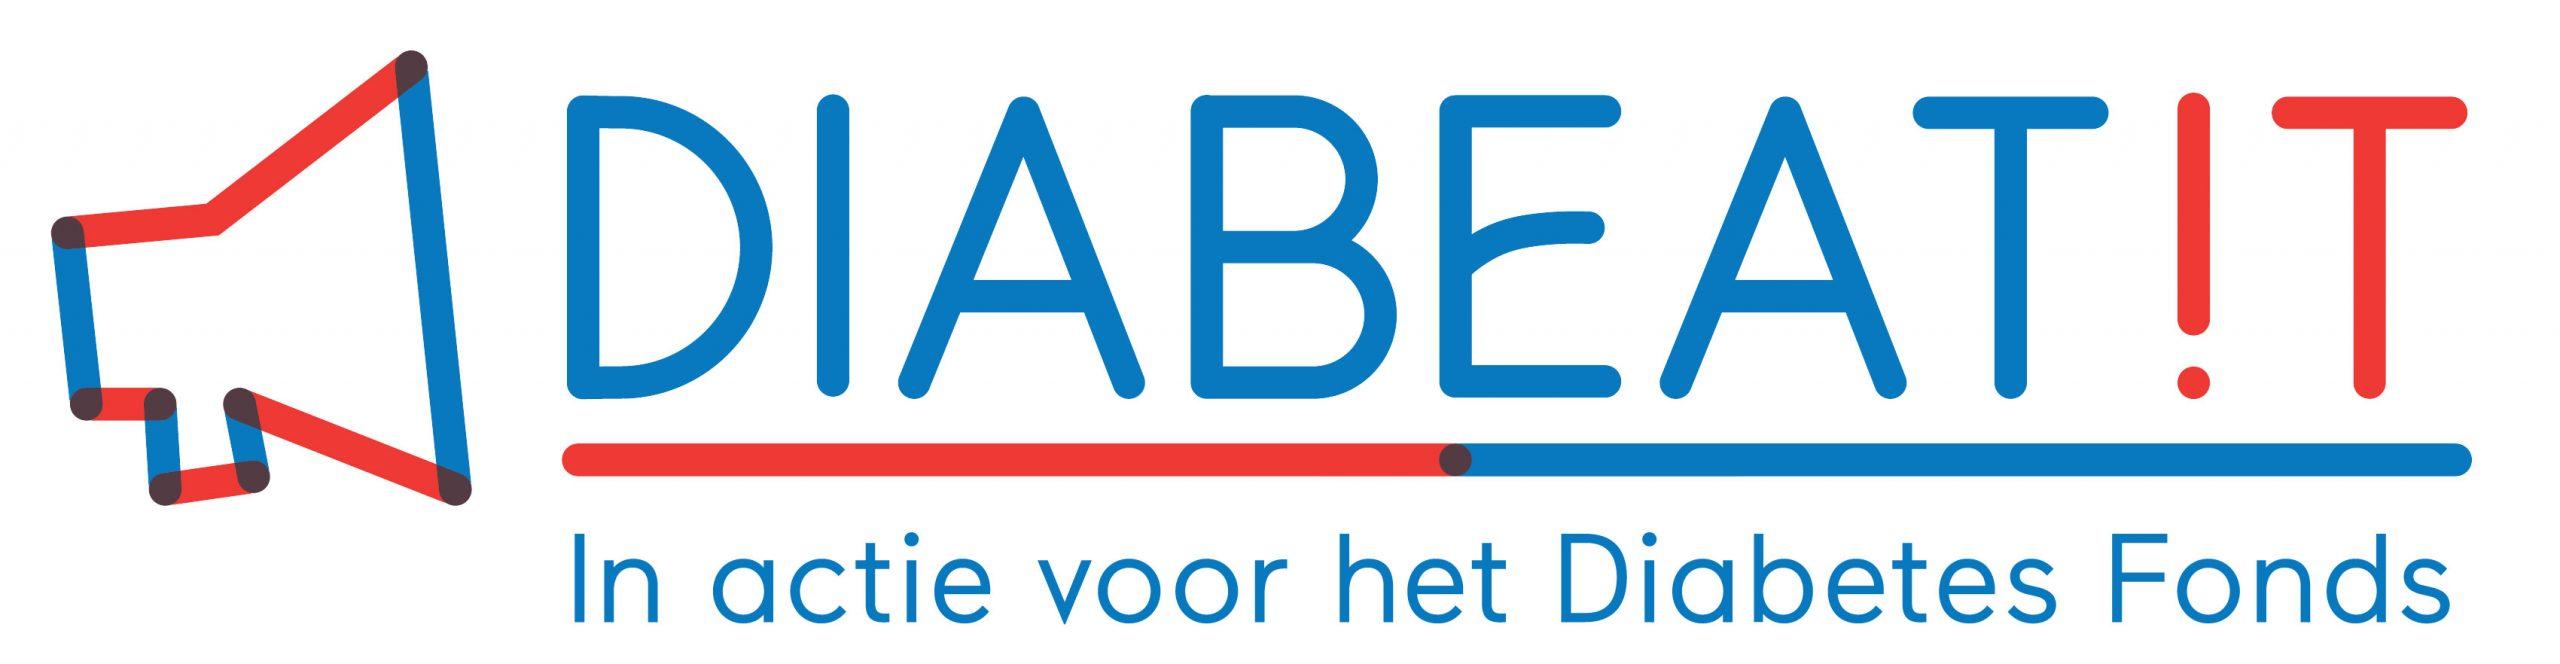 DB-logo-met-tagline_jpg